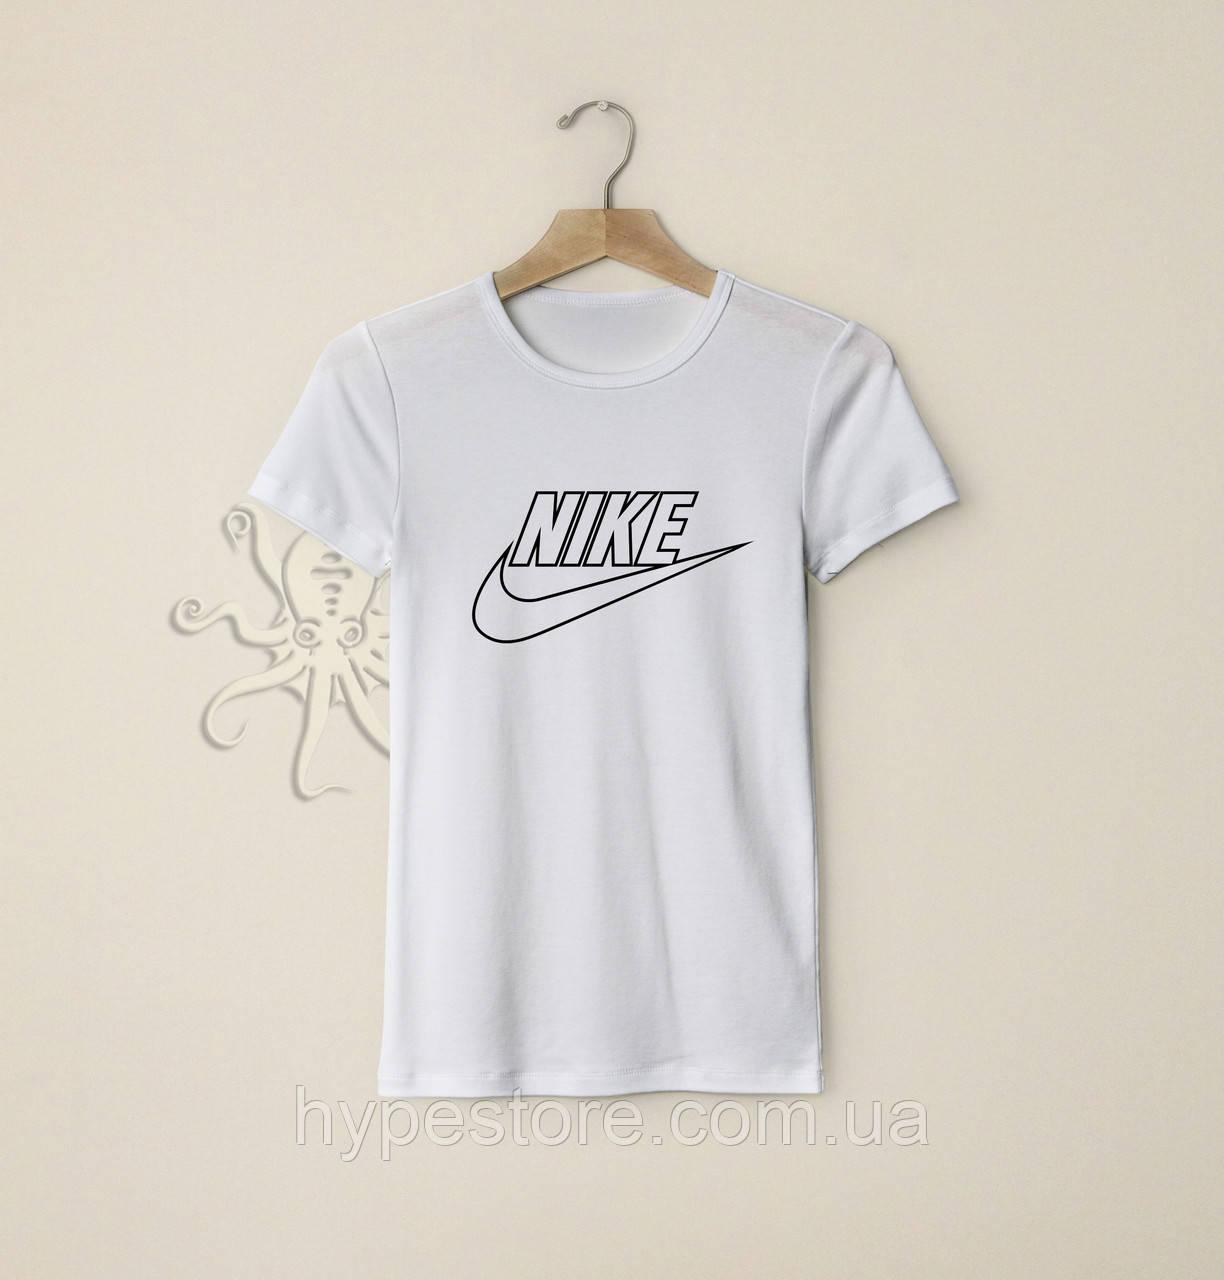 Мужская белая футболка, чоловіча футболка Nike Air, Реплика